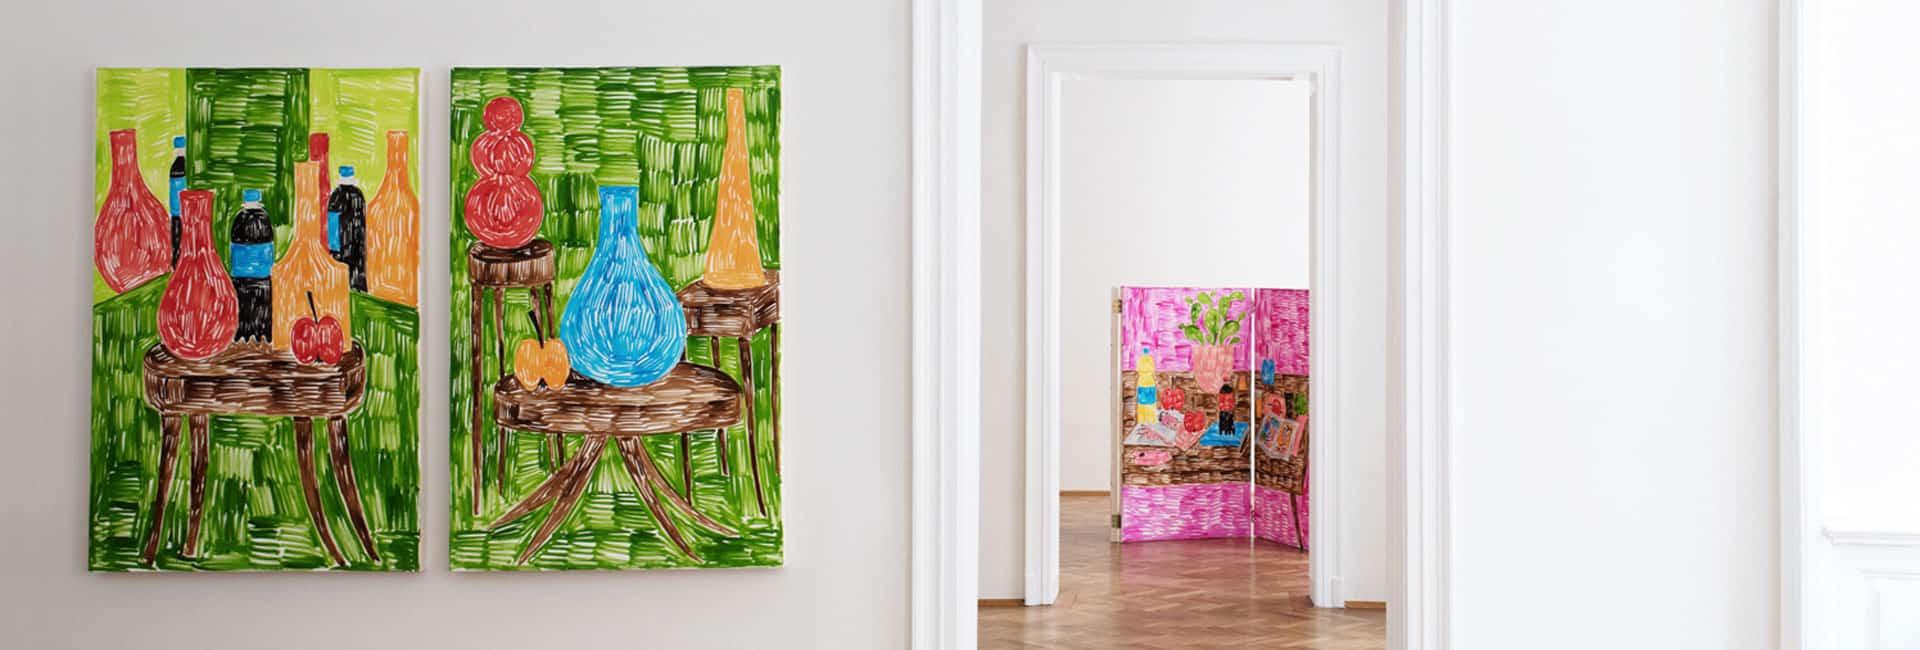 TheBirgit Lauda Art Foundation